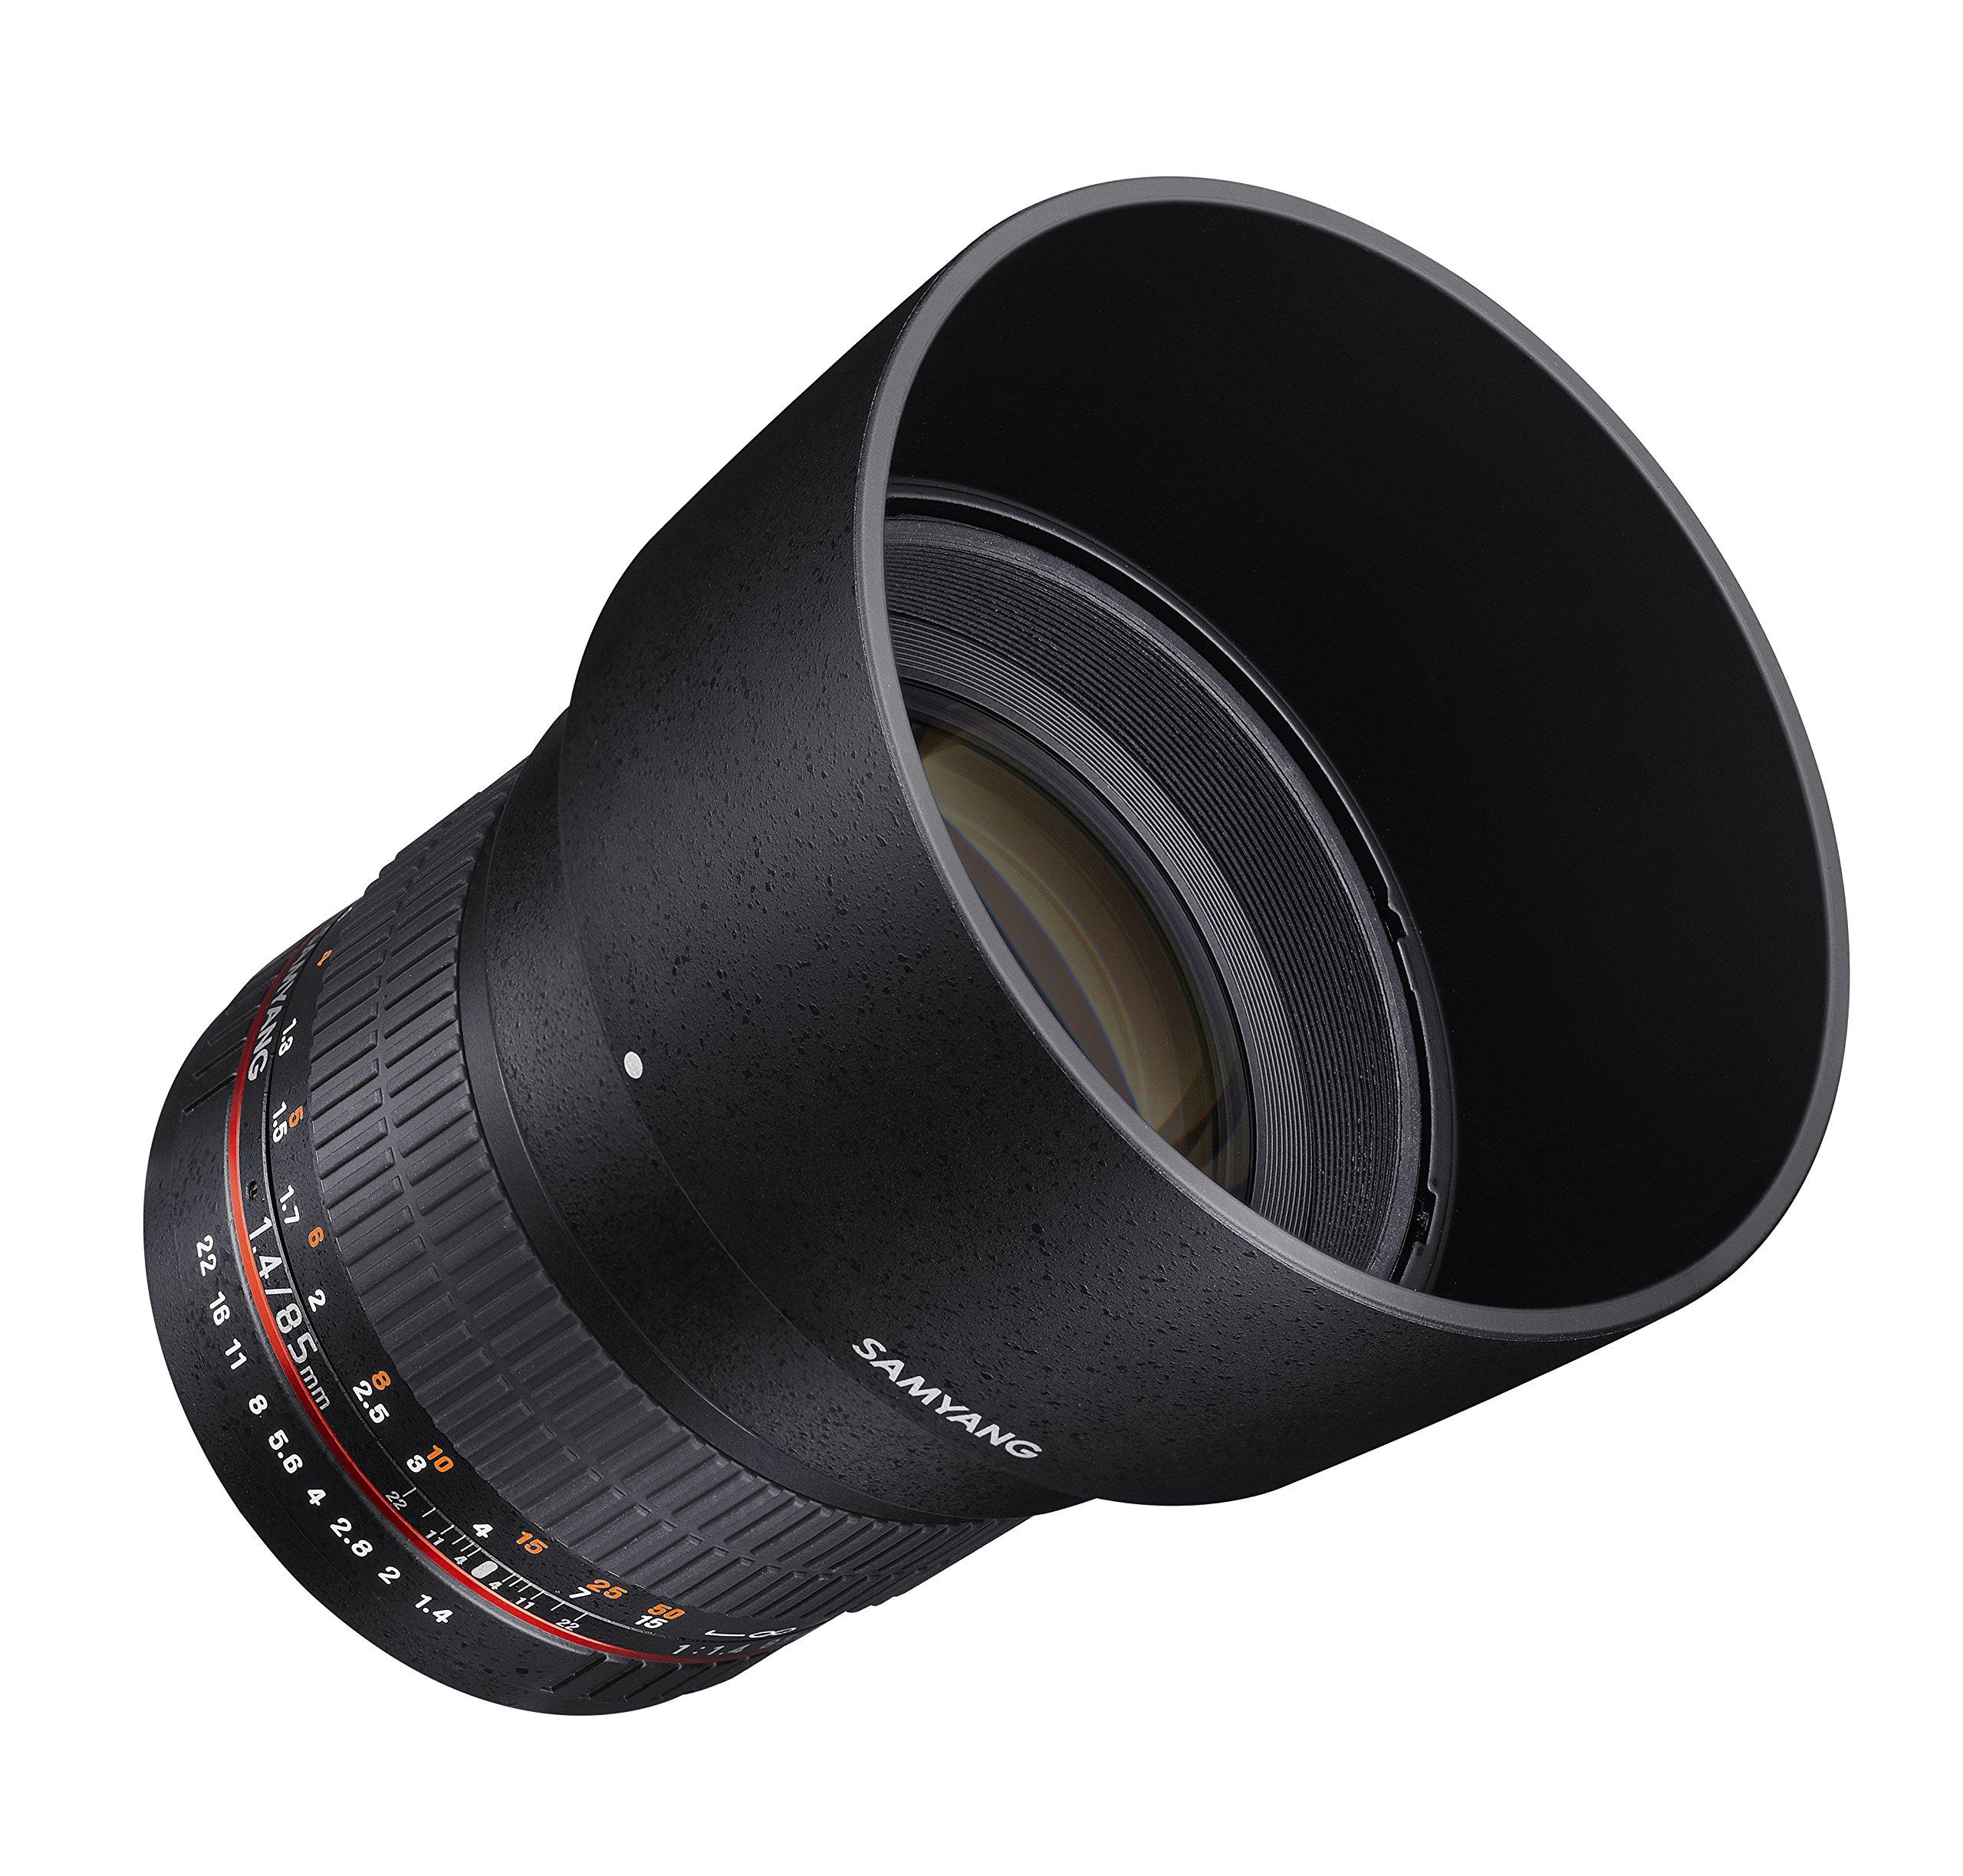 Samyang SY85M-P 85mm F1.4 Lens for Pentax by Samyang